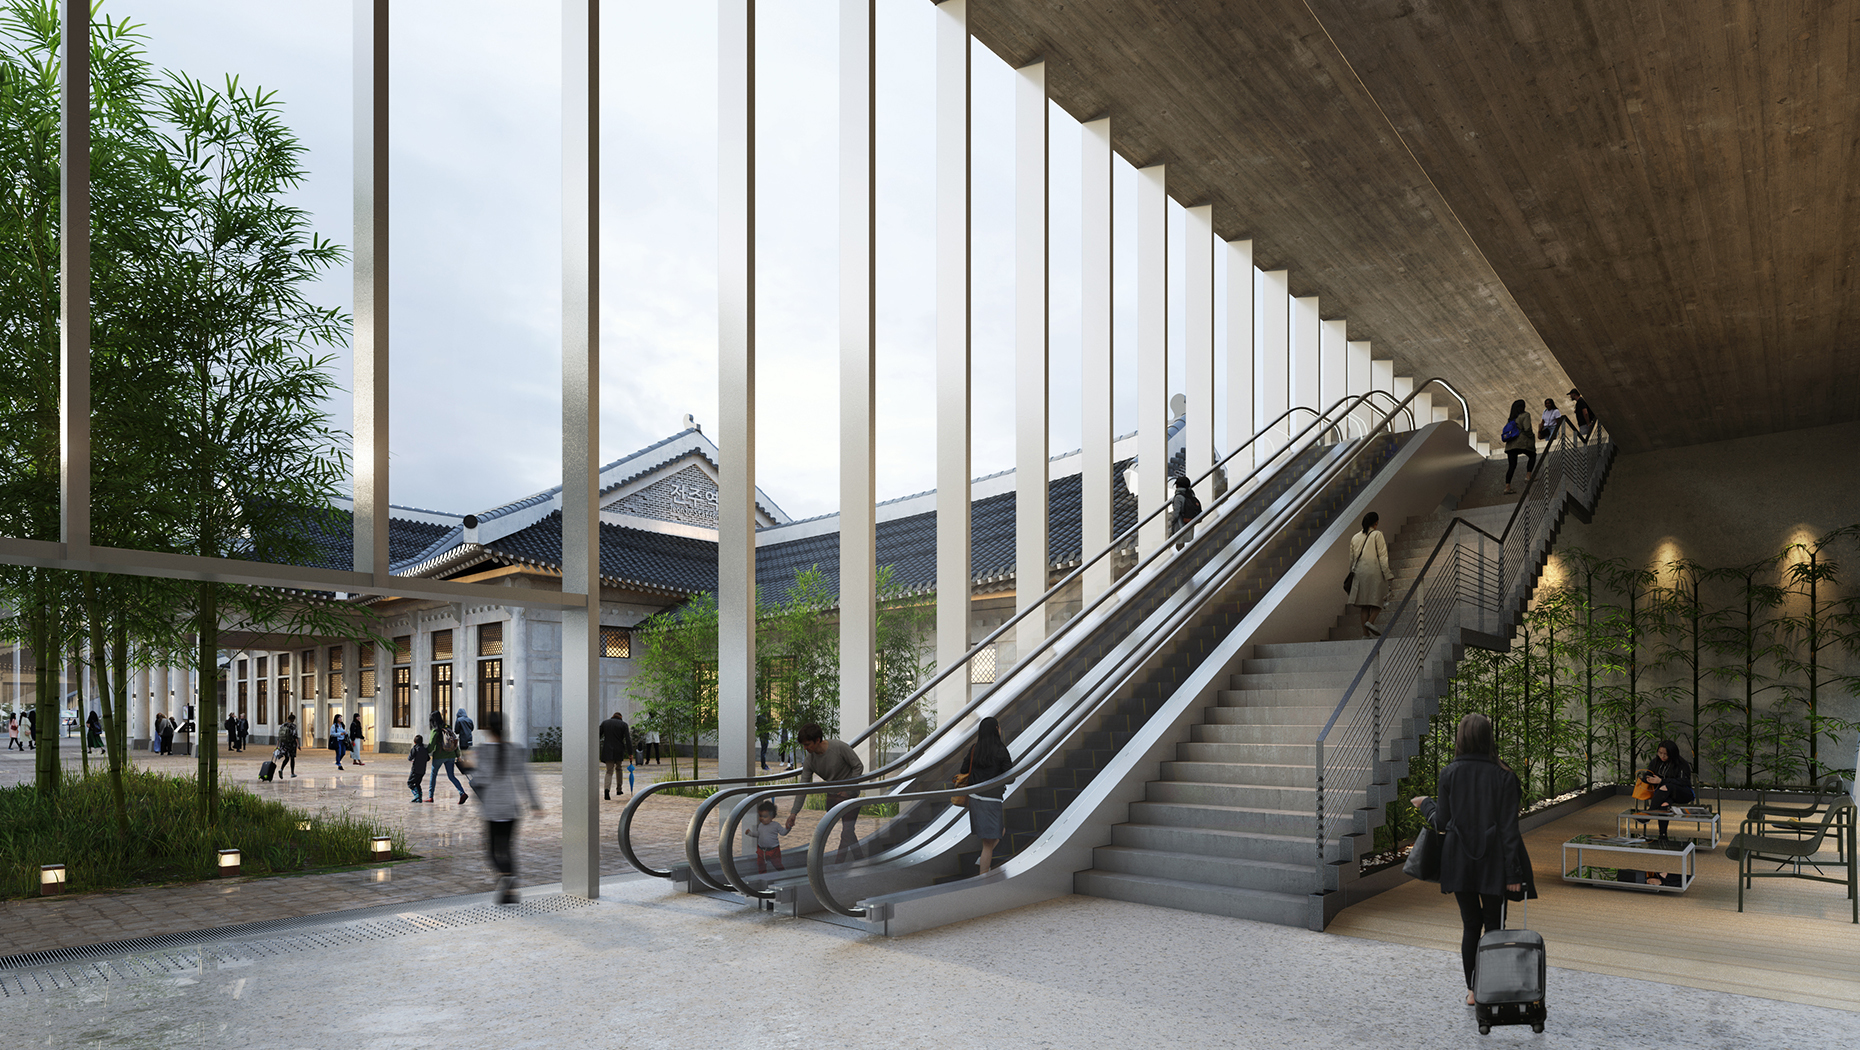 20190910 Jeonju Station Interior Perspective 01